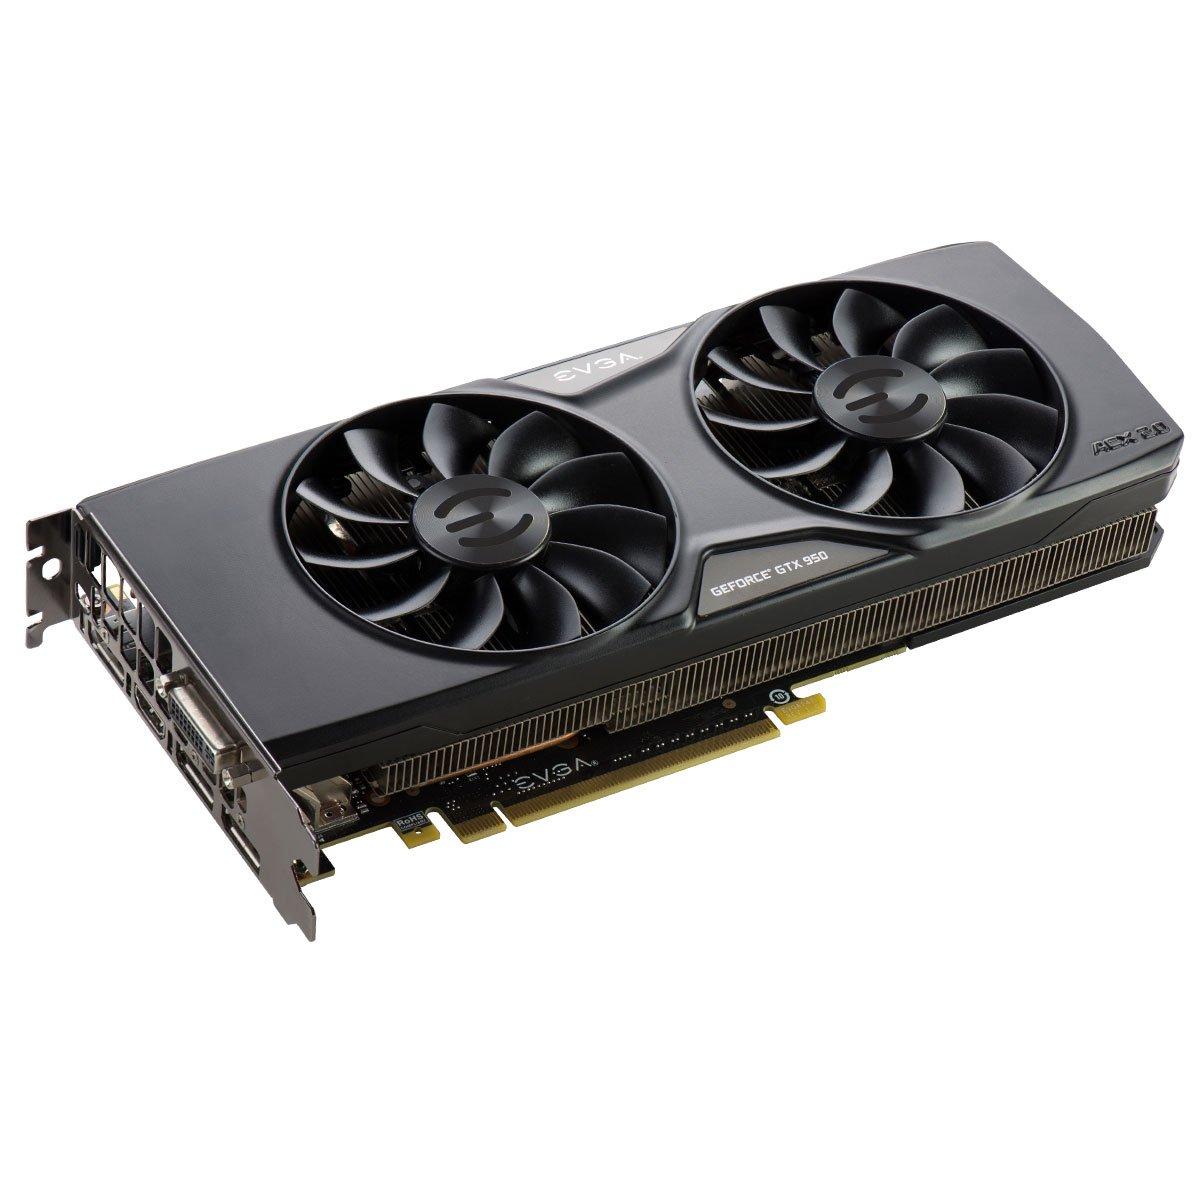 EVGA 02G-P4-2956-KR GeForce GTX 950 2GB GDDR5 - Tarjeta gráfica (GeForce GTX 950, 2 GB, GDDR5, 128 bit, 4096 x 2160 Pixeles, PCI Express x16 3.0)